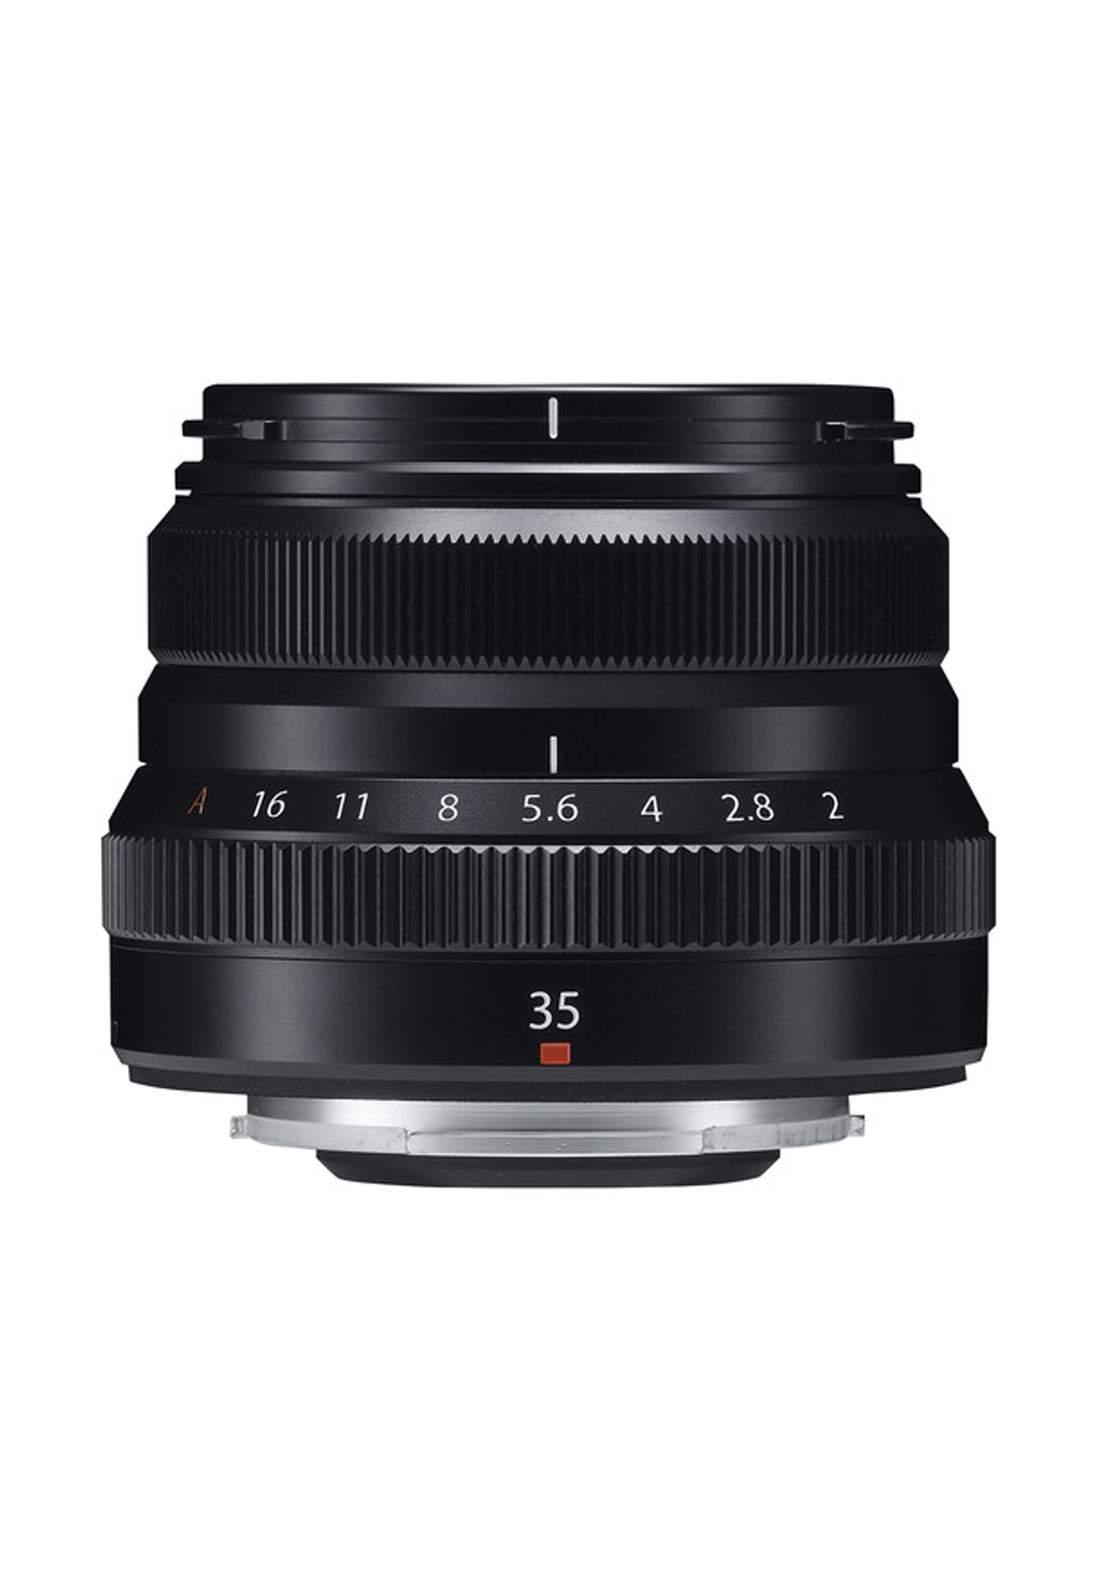 Fujifilm XF 35mm F2 R WR Lens  - Black عدسة كاميرا